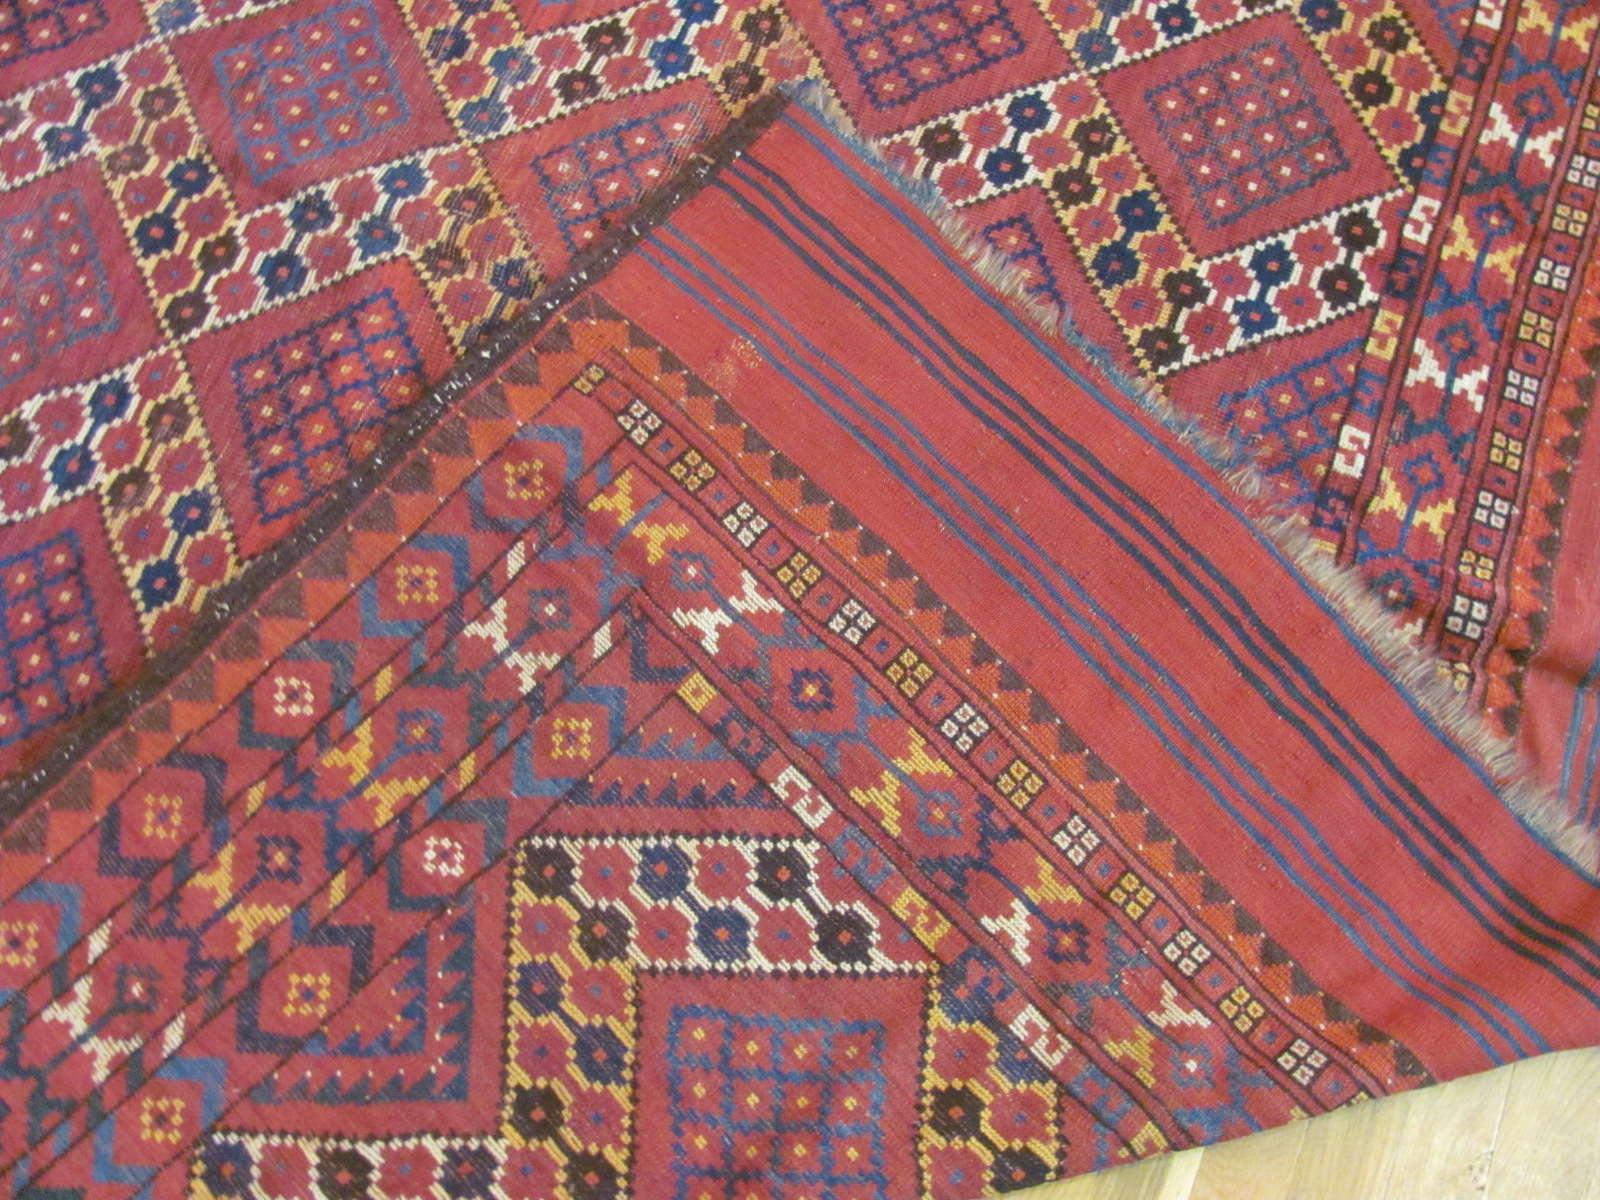 24283 antique Afghani Beshir carpet 7,3 x 17,7 (1)